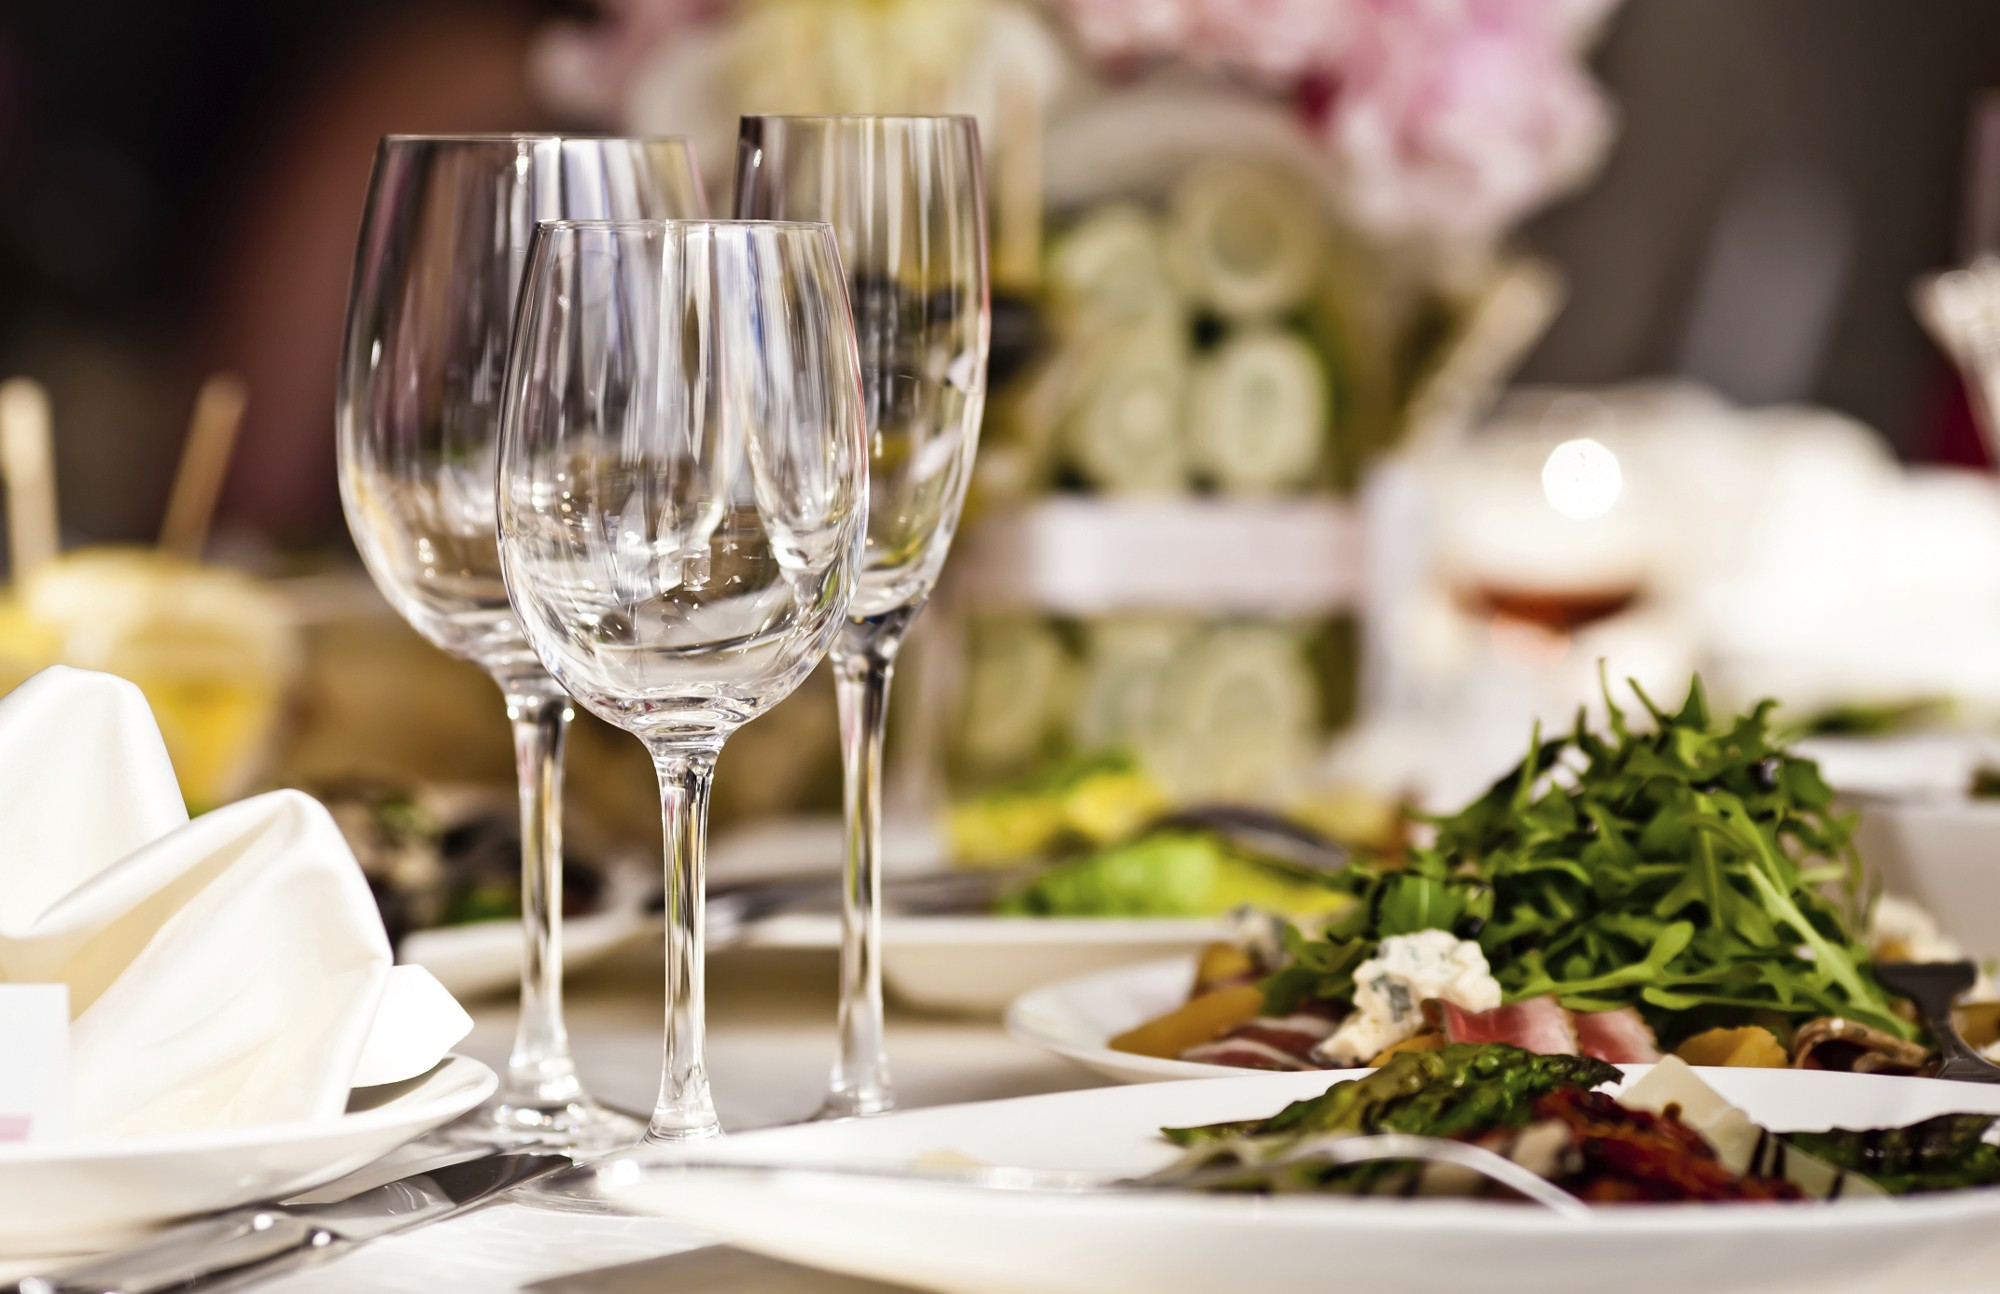 restaurante, taças, luxo (Foto: Thinkstock)